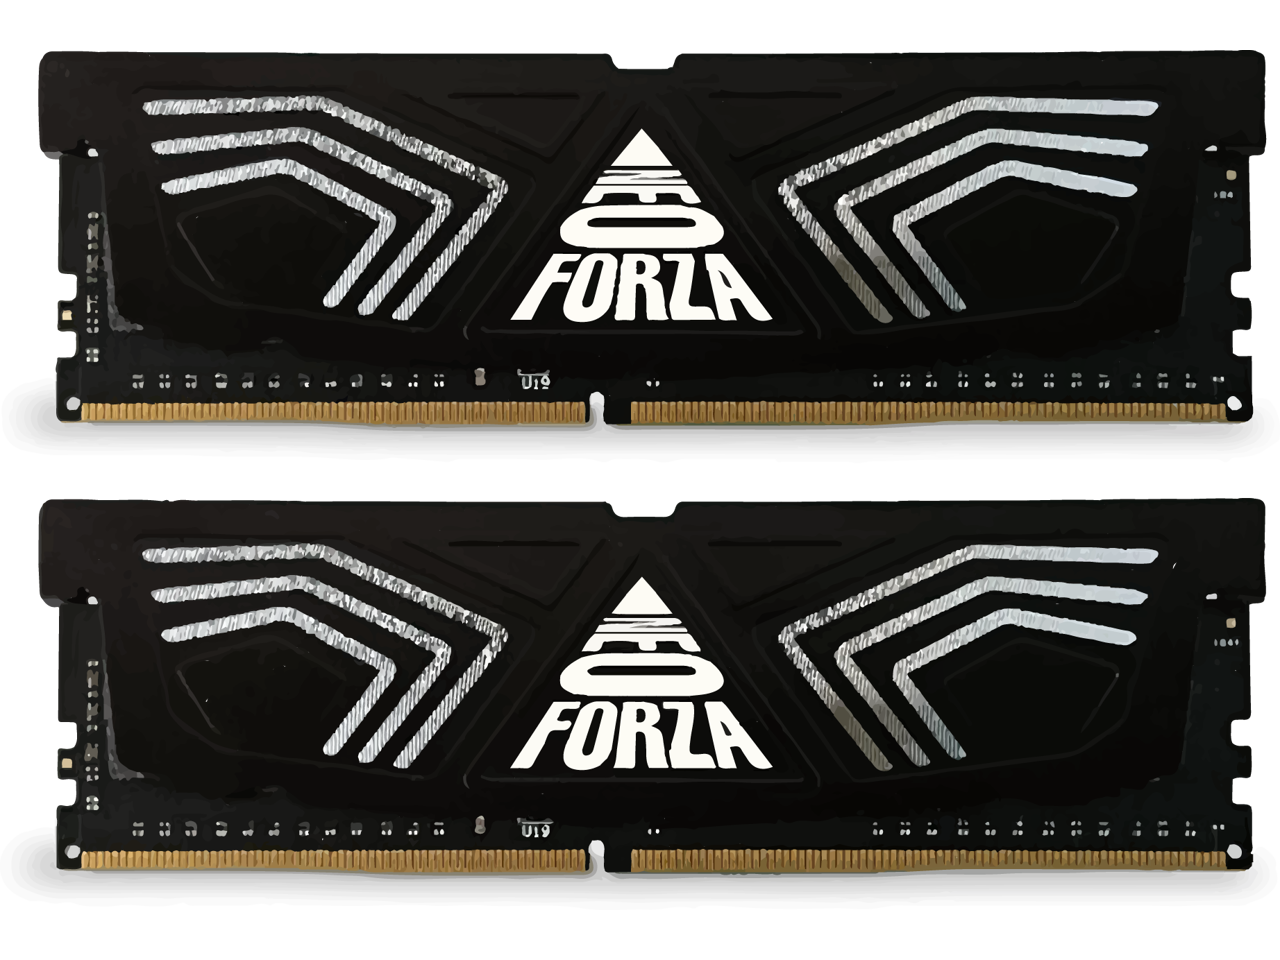 Neo Forza FAYE 32GB (2x16GB) 288-Pin DDR4 3600 18-19-19-39 SDRAM Desktop RAM for $123.99 w/ FS after Code